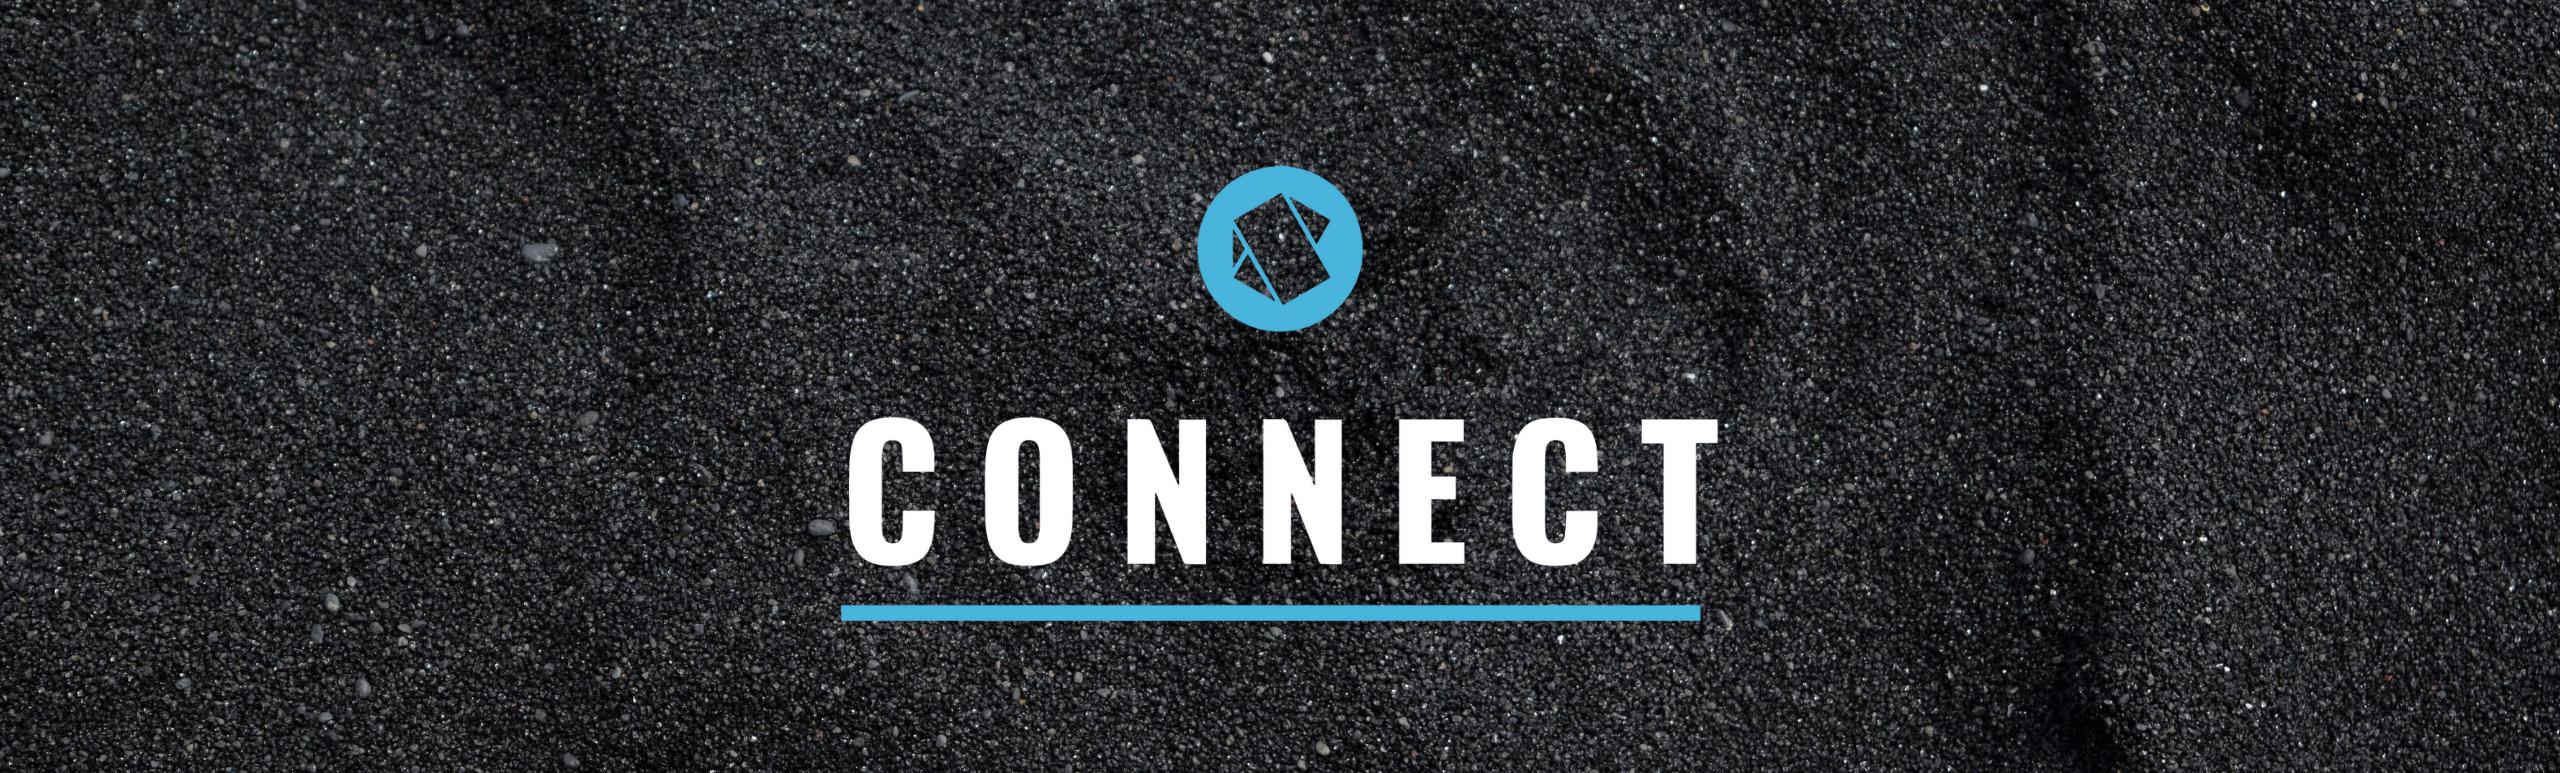 Connect Mobile CTA